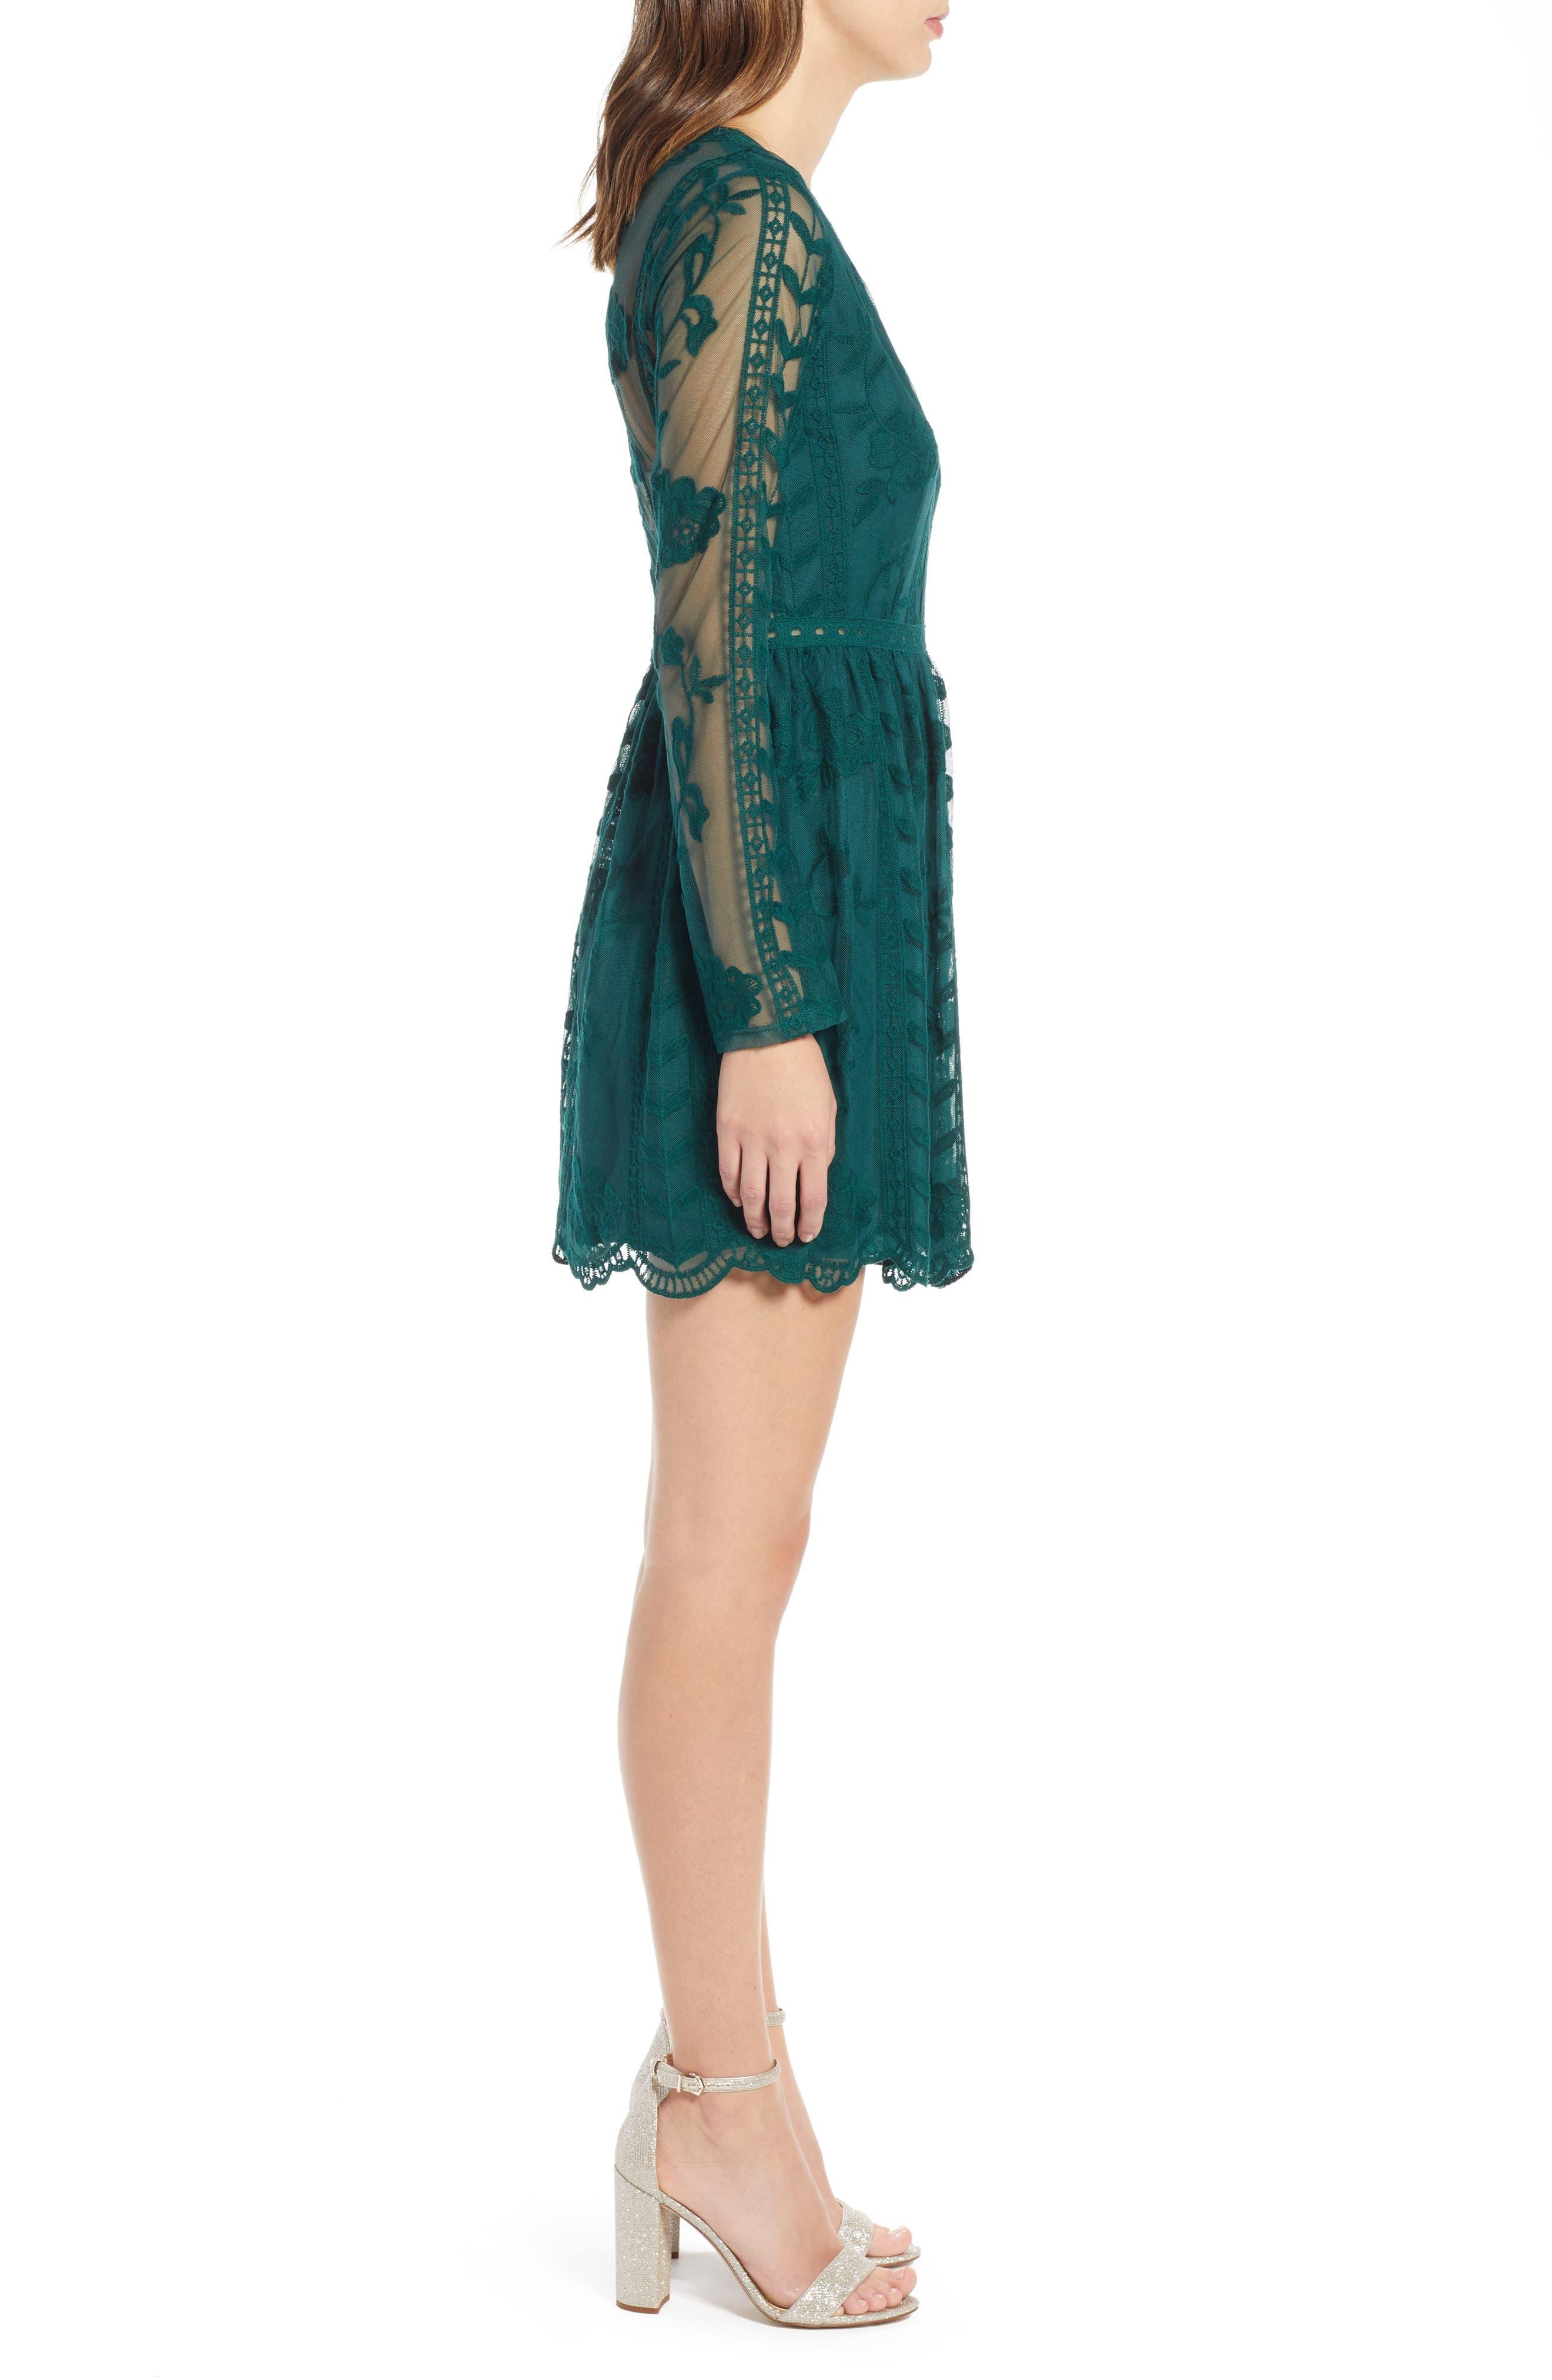 SOCIALITE,                             Long Sleeve V-Neck Lace Dress,                             Alternate thumbnail 3, color,                             300